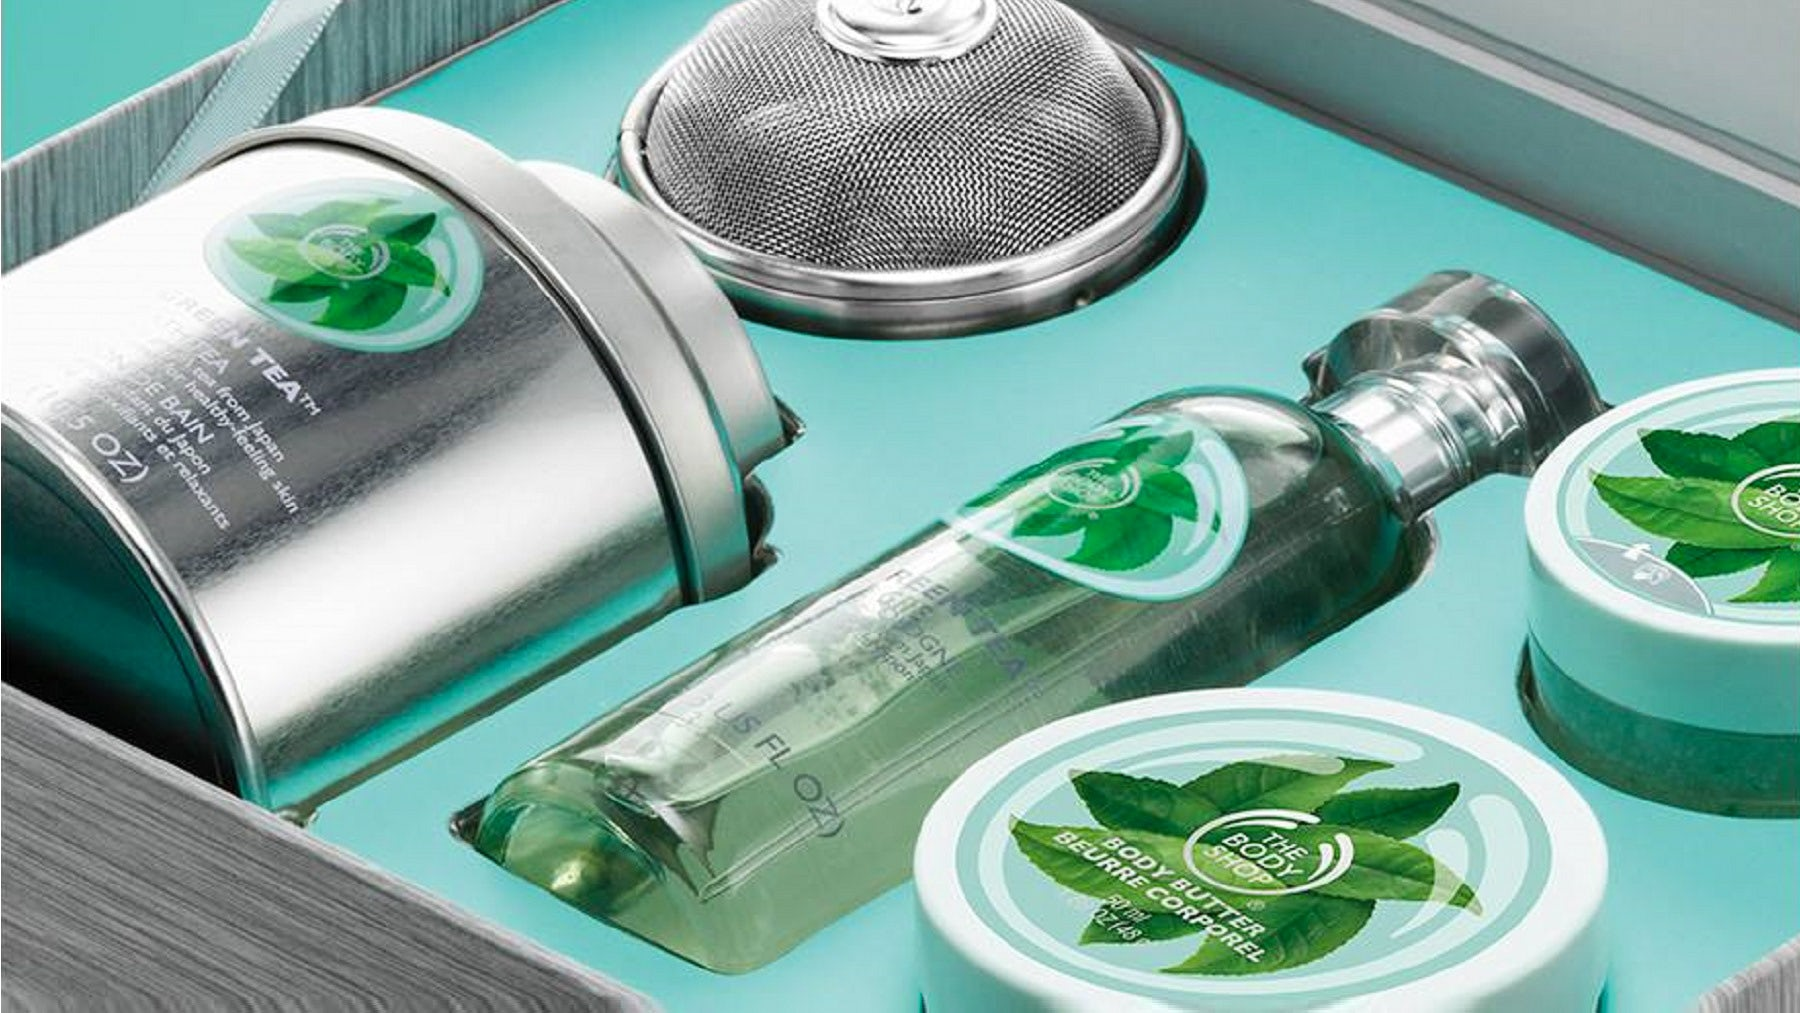 The Body Shop's Fuji Green Tea range | Source: The Body Shop